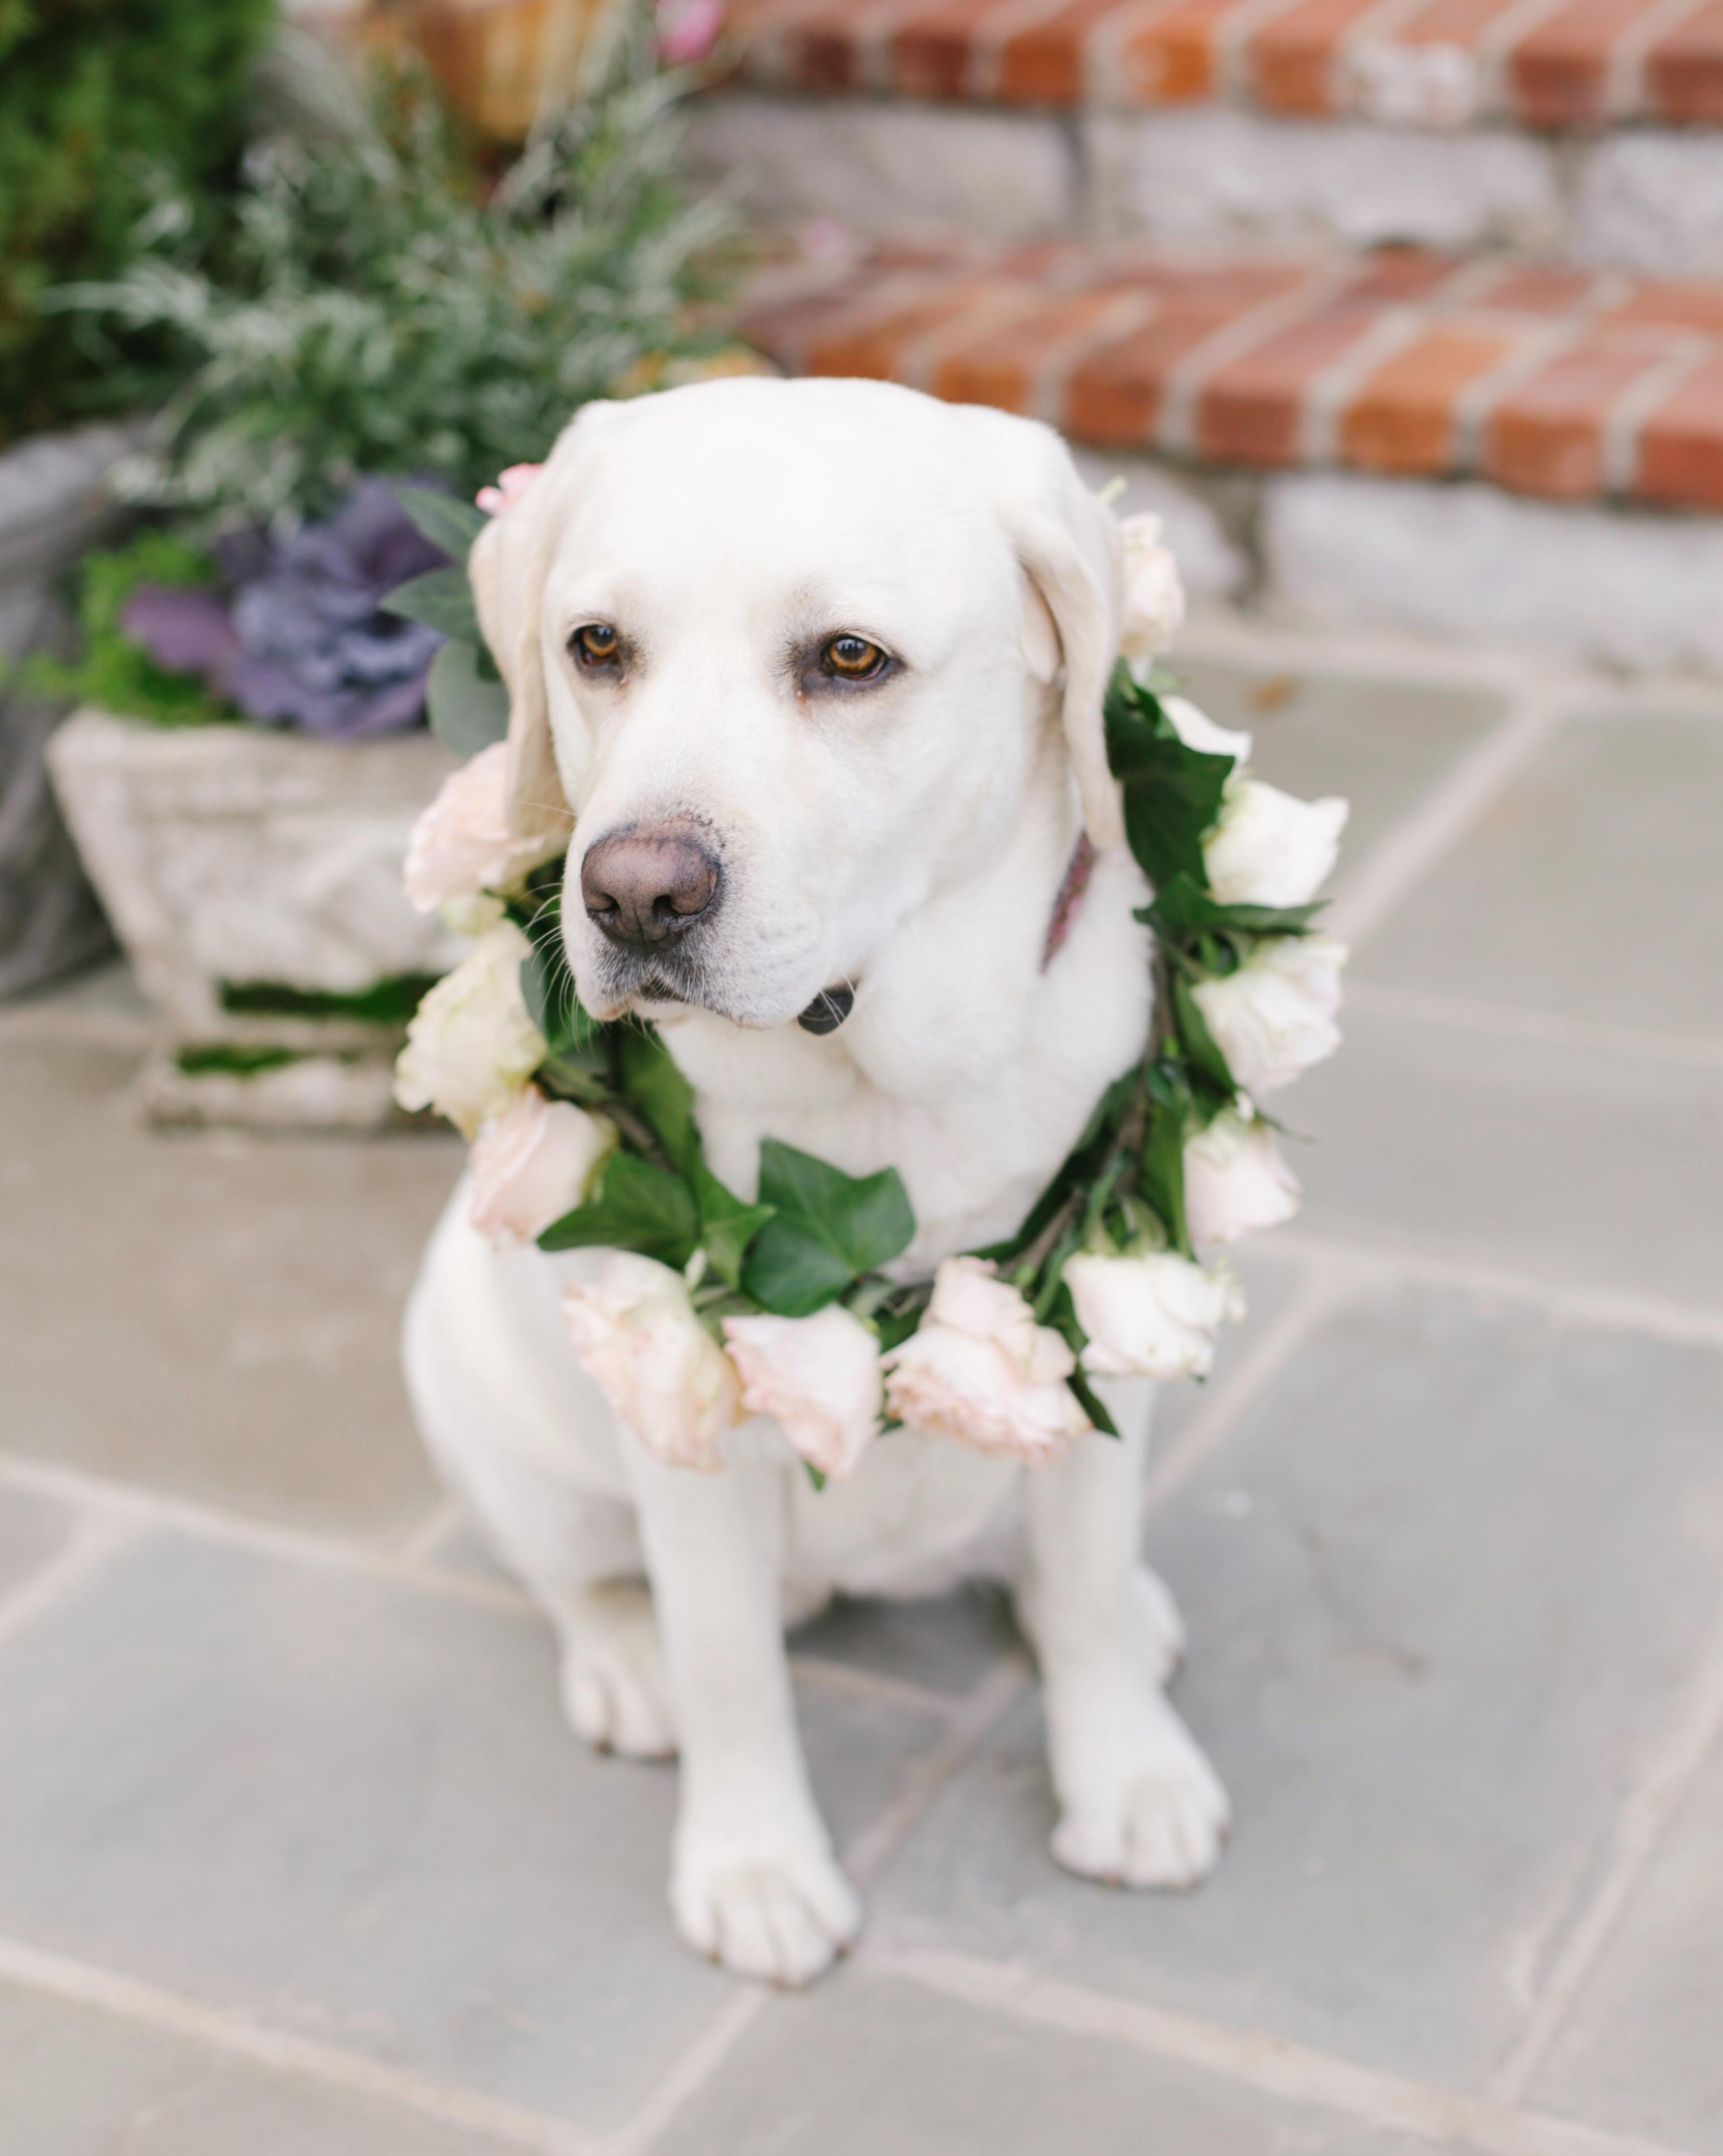 destiny-taylor-wedding-dog-211-s112347-1115.jpg